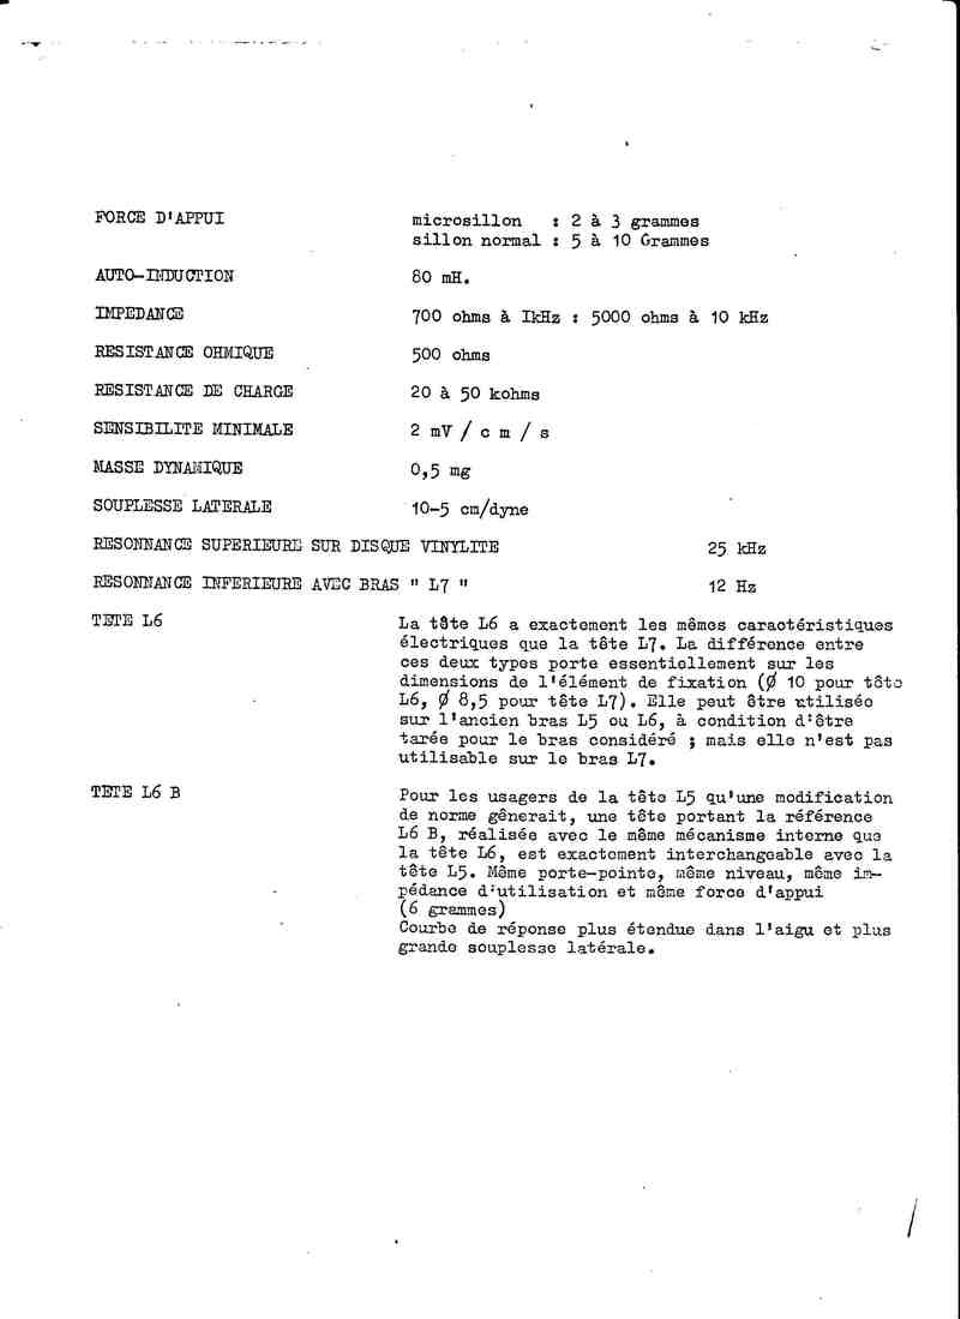 http://viktor-a-shapkin.narod.ru/olderfiles/11/0_data_tetel628ol.jpg